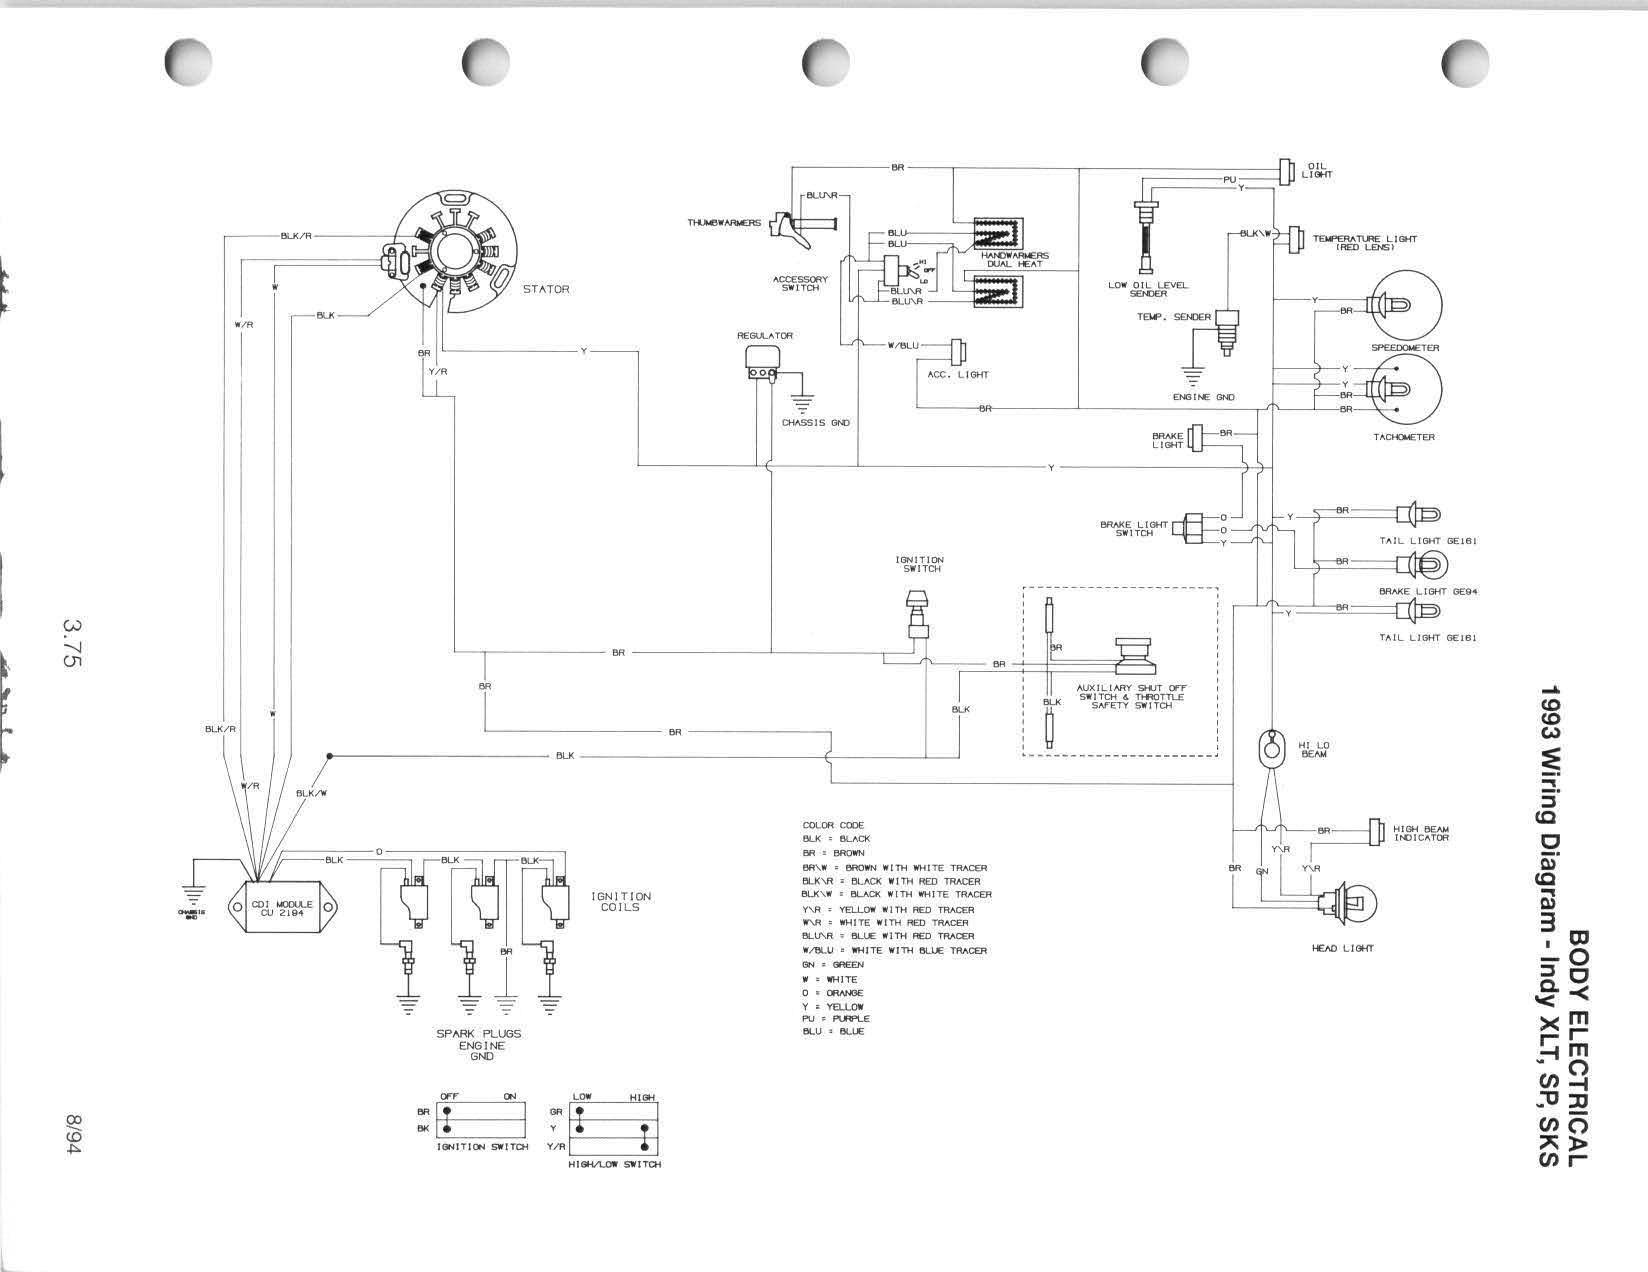 hight resolution of polaris snowmobile engine diagrams wiring diagram schematicssnowmobile engine diagram wiring diagram 2002 polaris snowmobile wiring diagrams